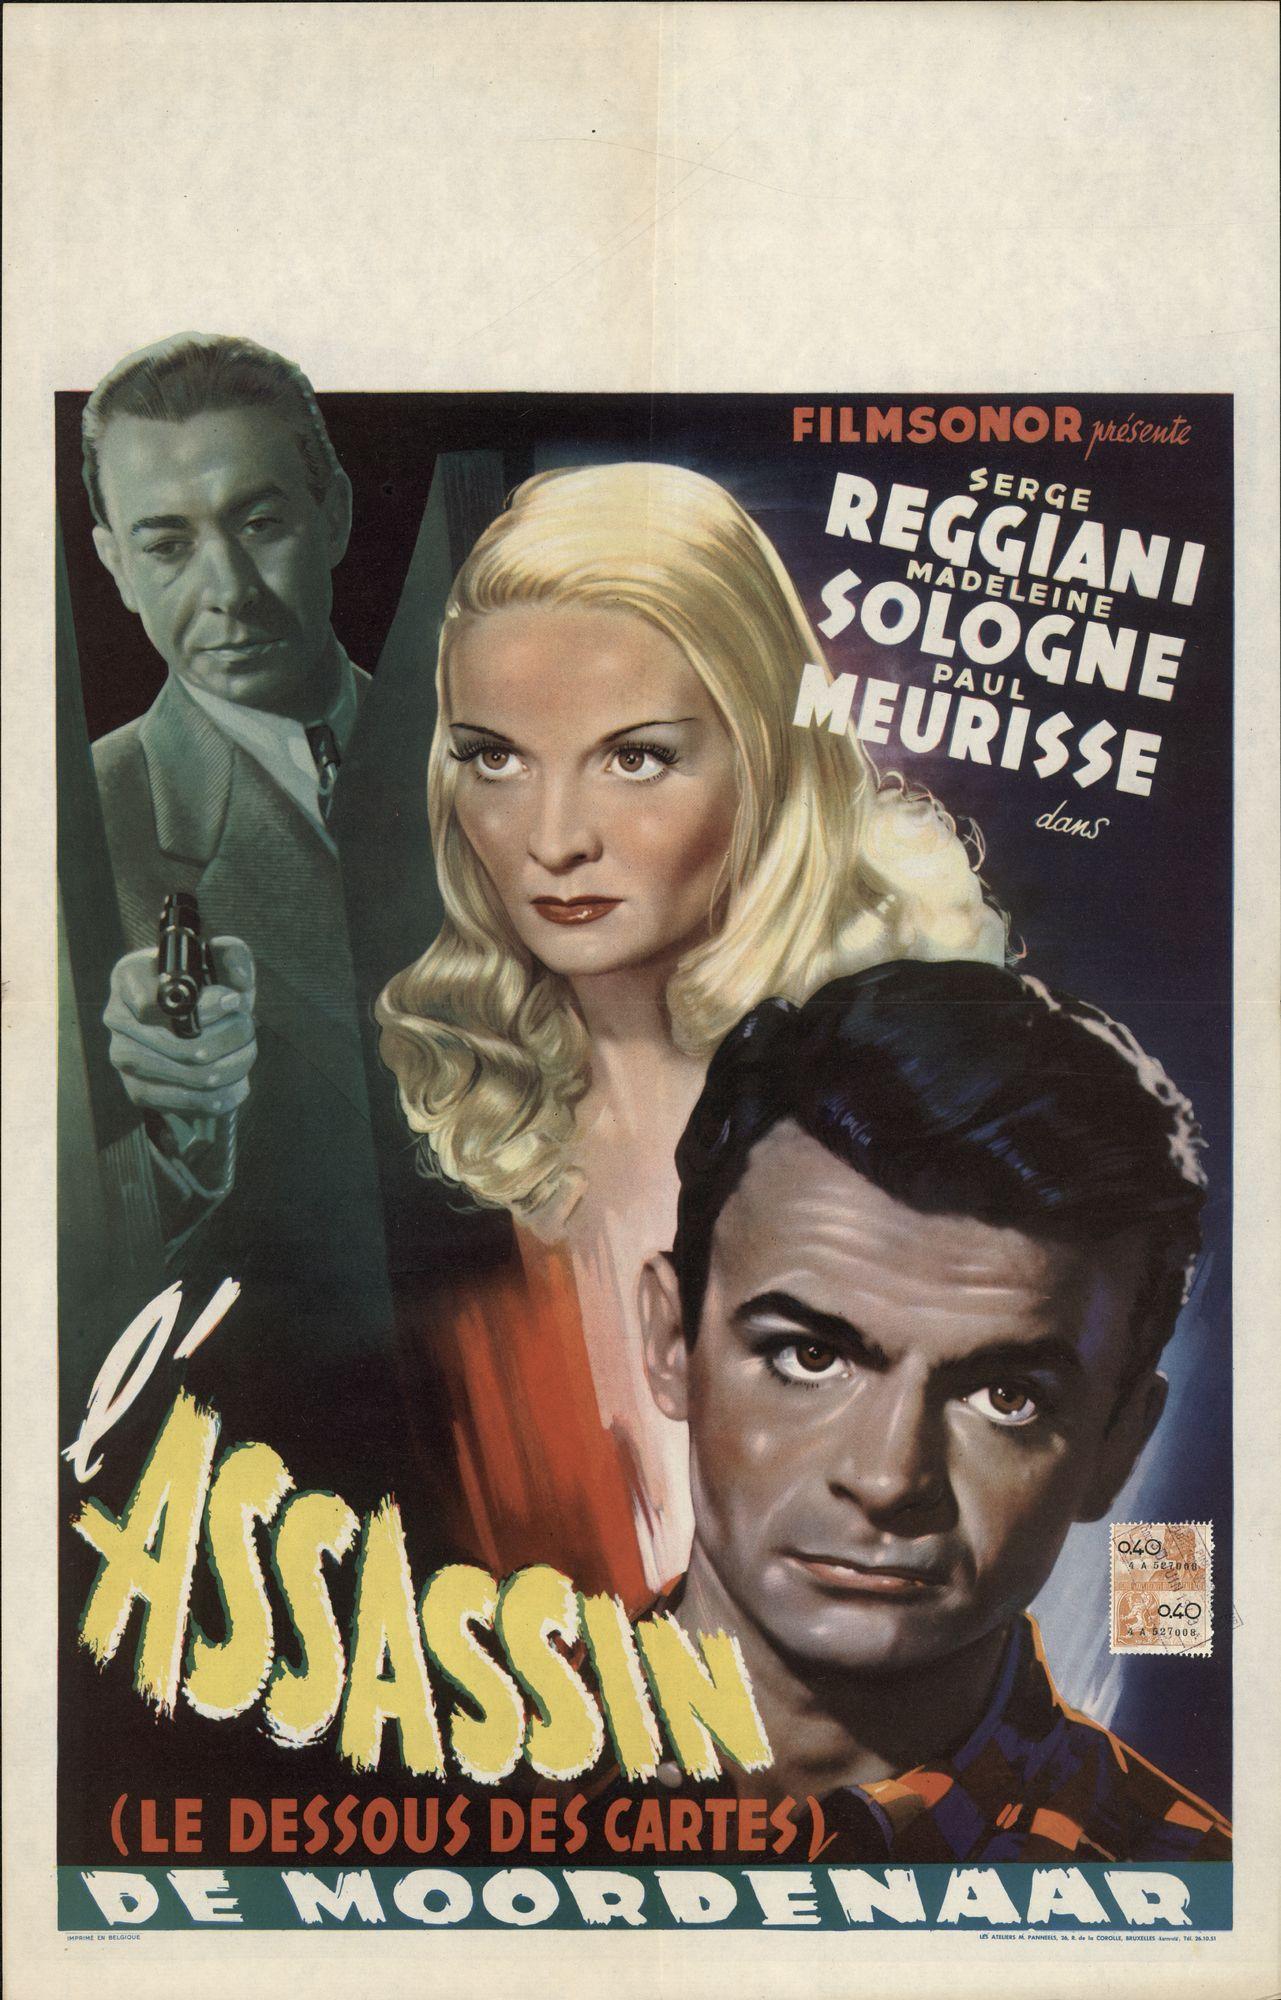 L'Assasin (Le Dessous des Cartes)   De Moordenaar, 1949